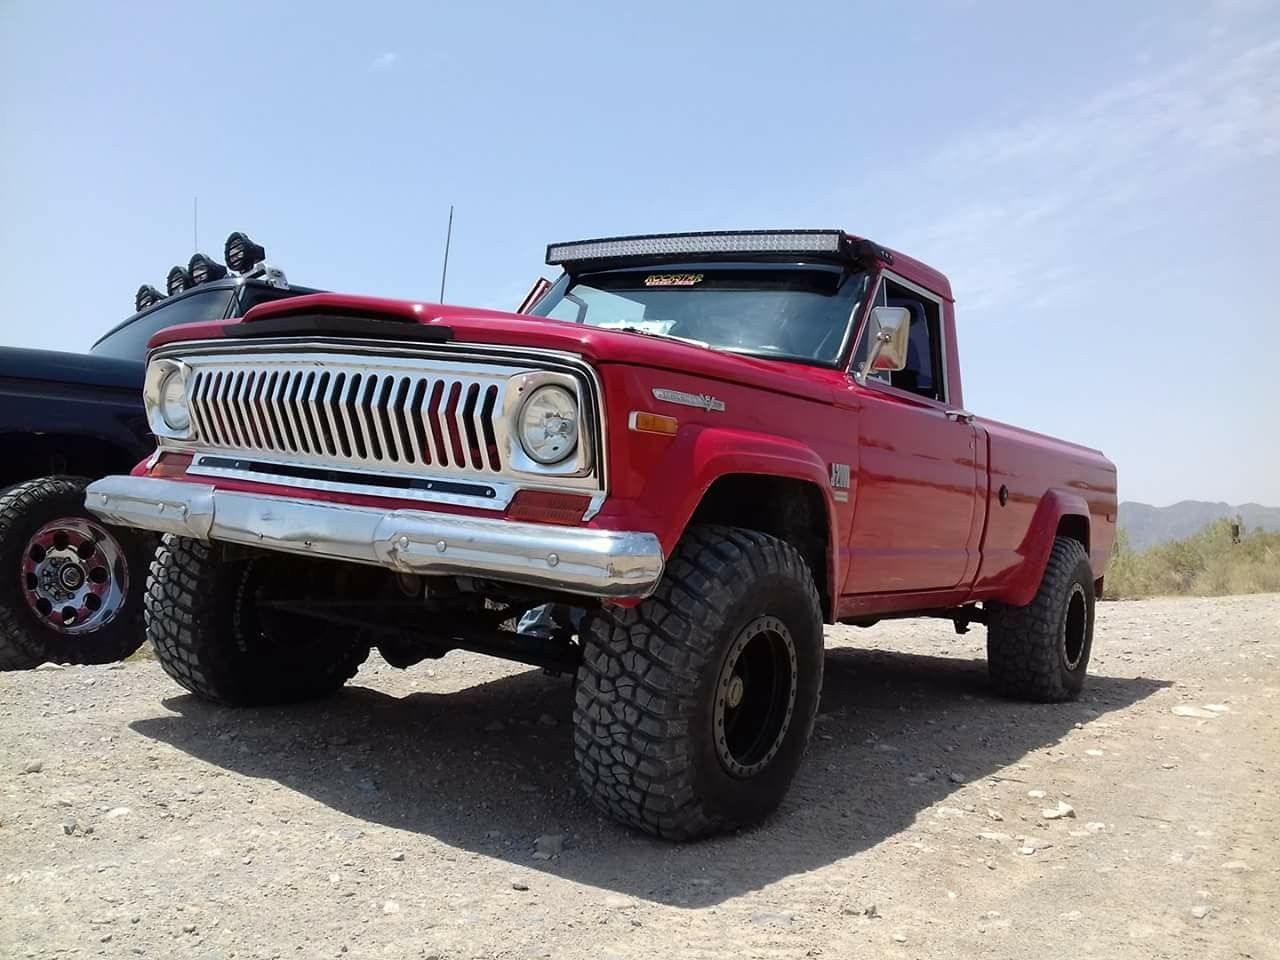 Pin By Rebecca Jurkovich On Jeep Mostly Jeep Truck Jeep